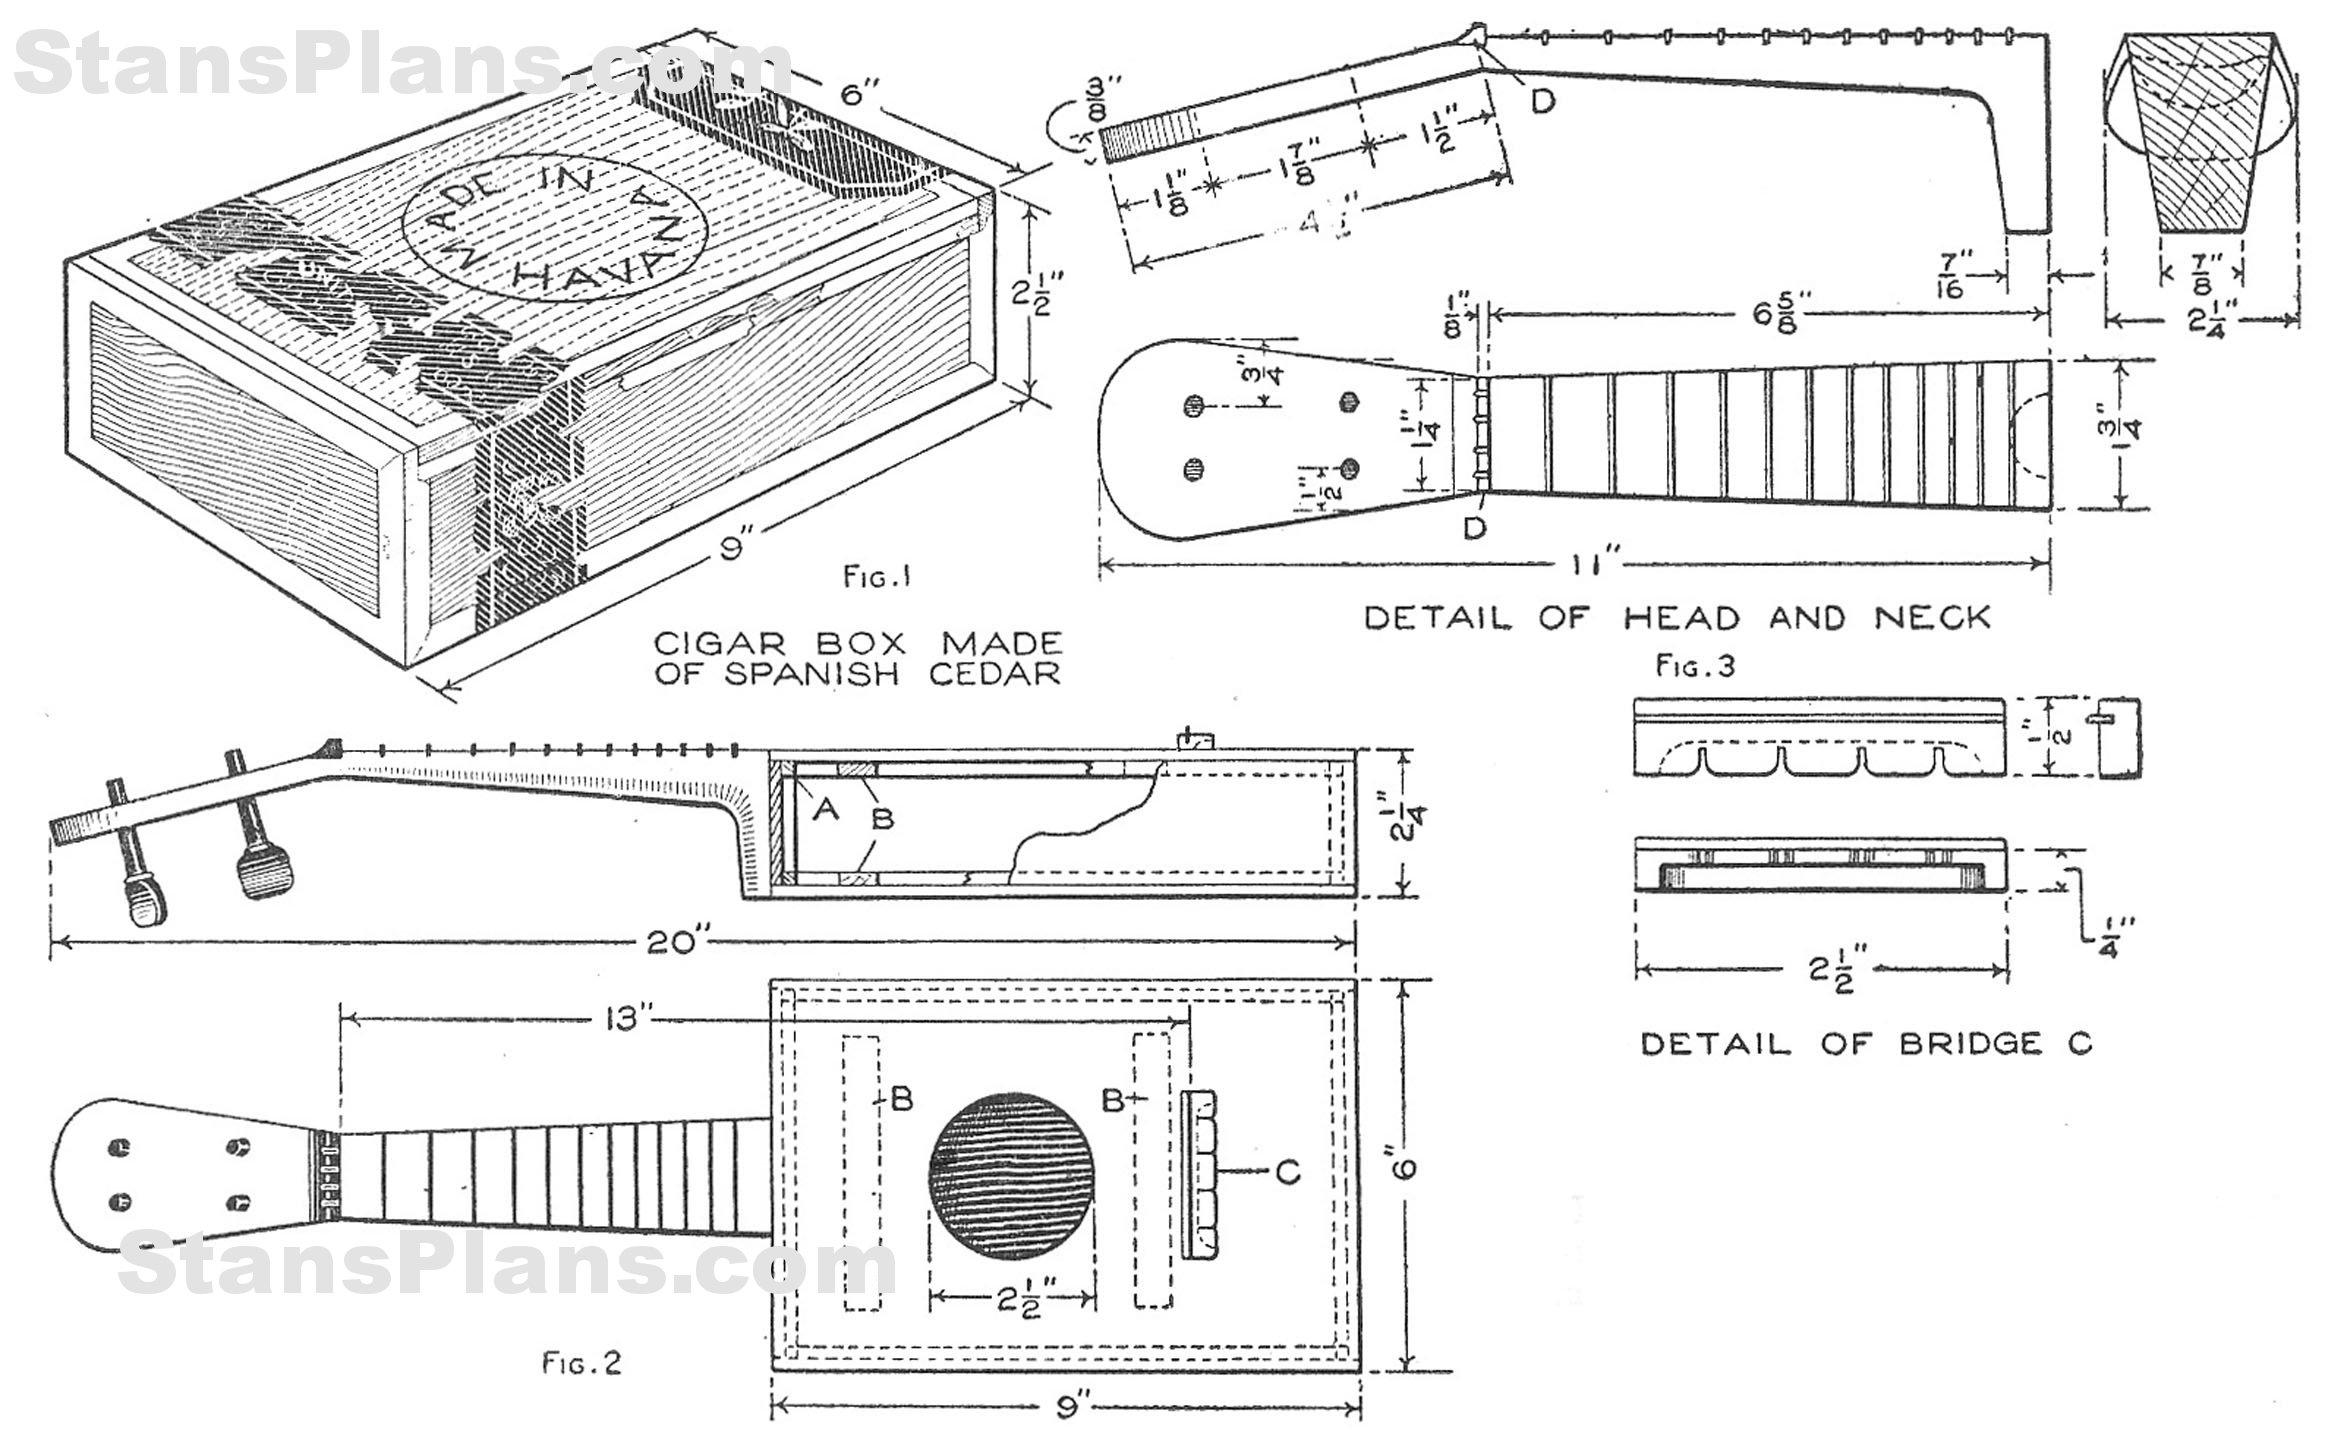 Printable Plans for a Homemade Ukulele